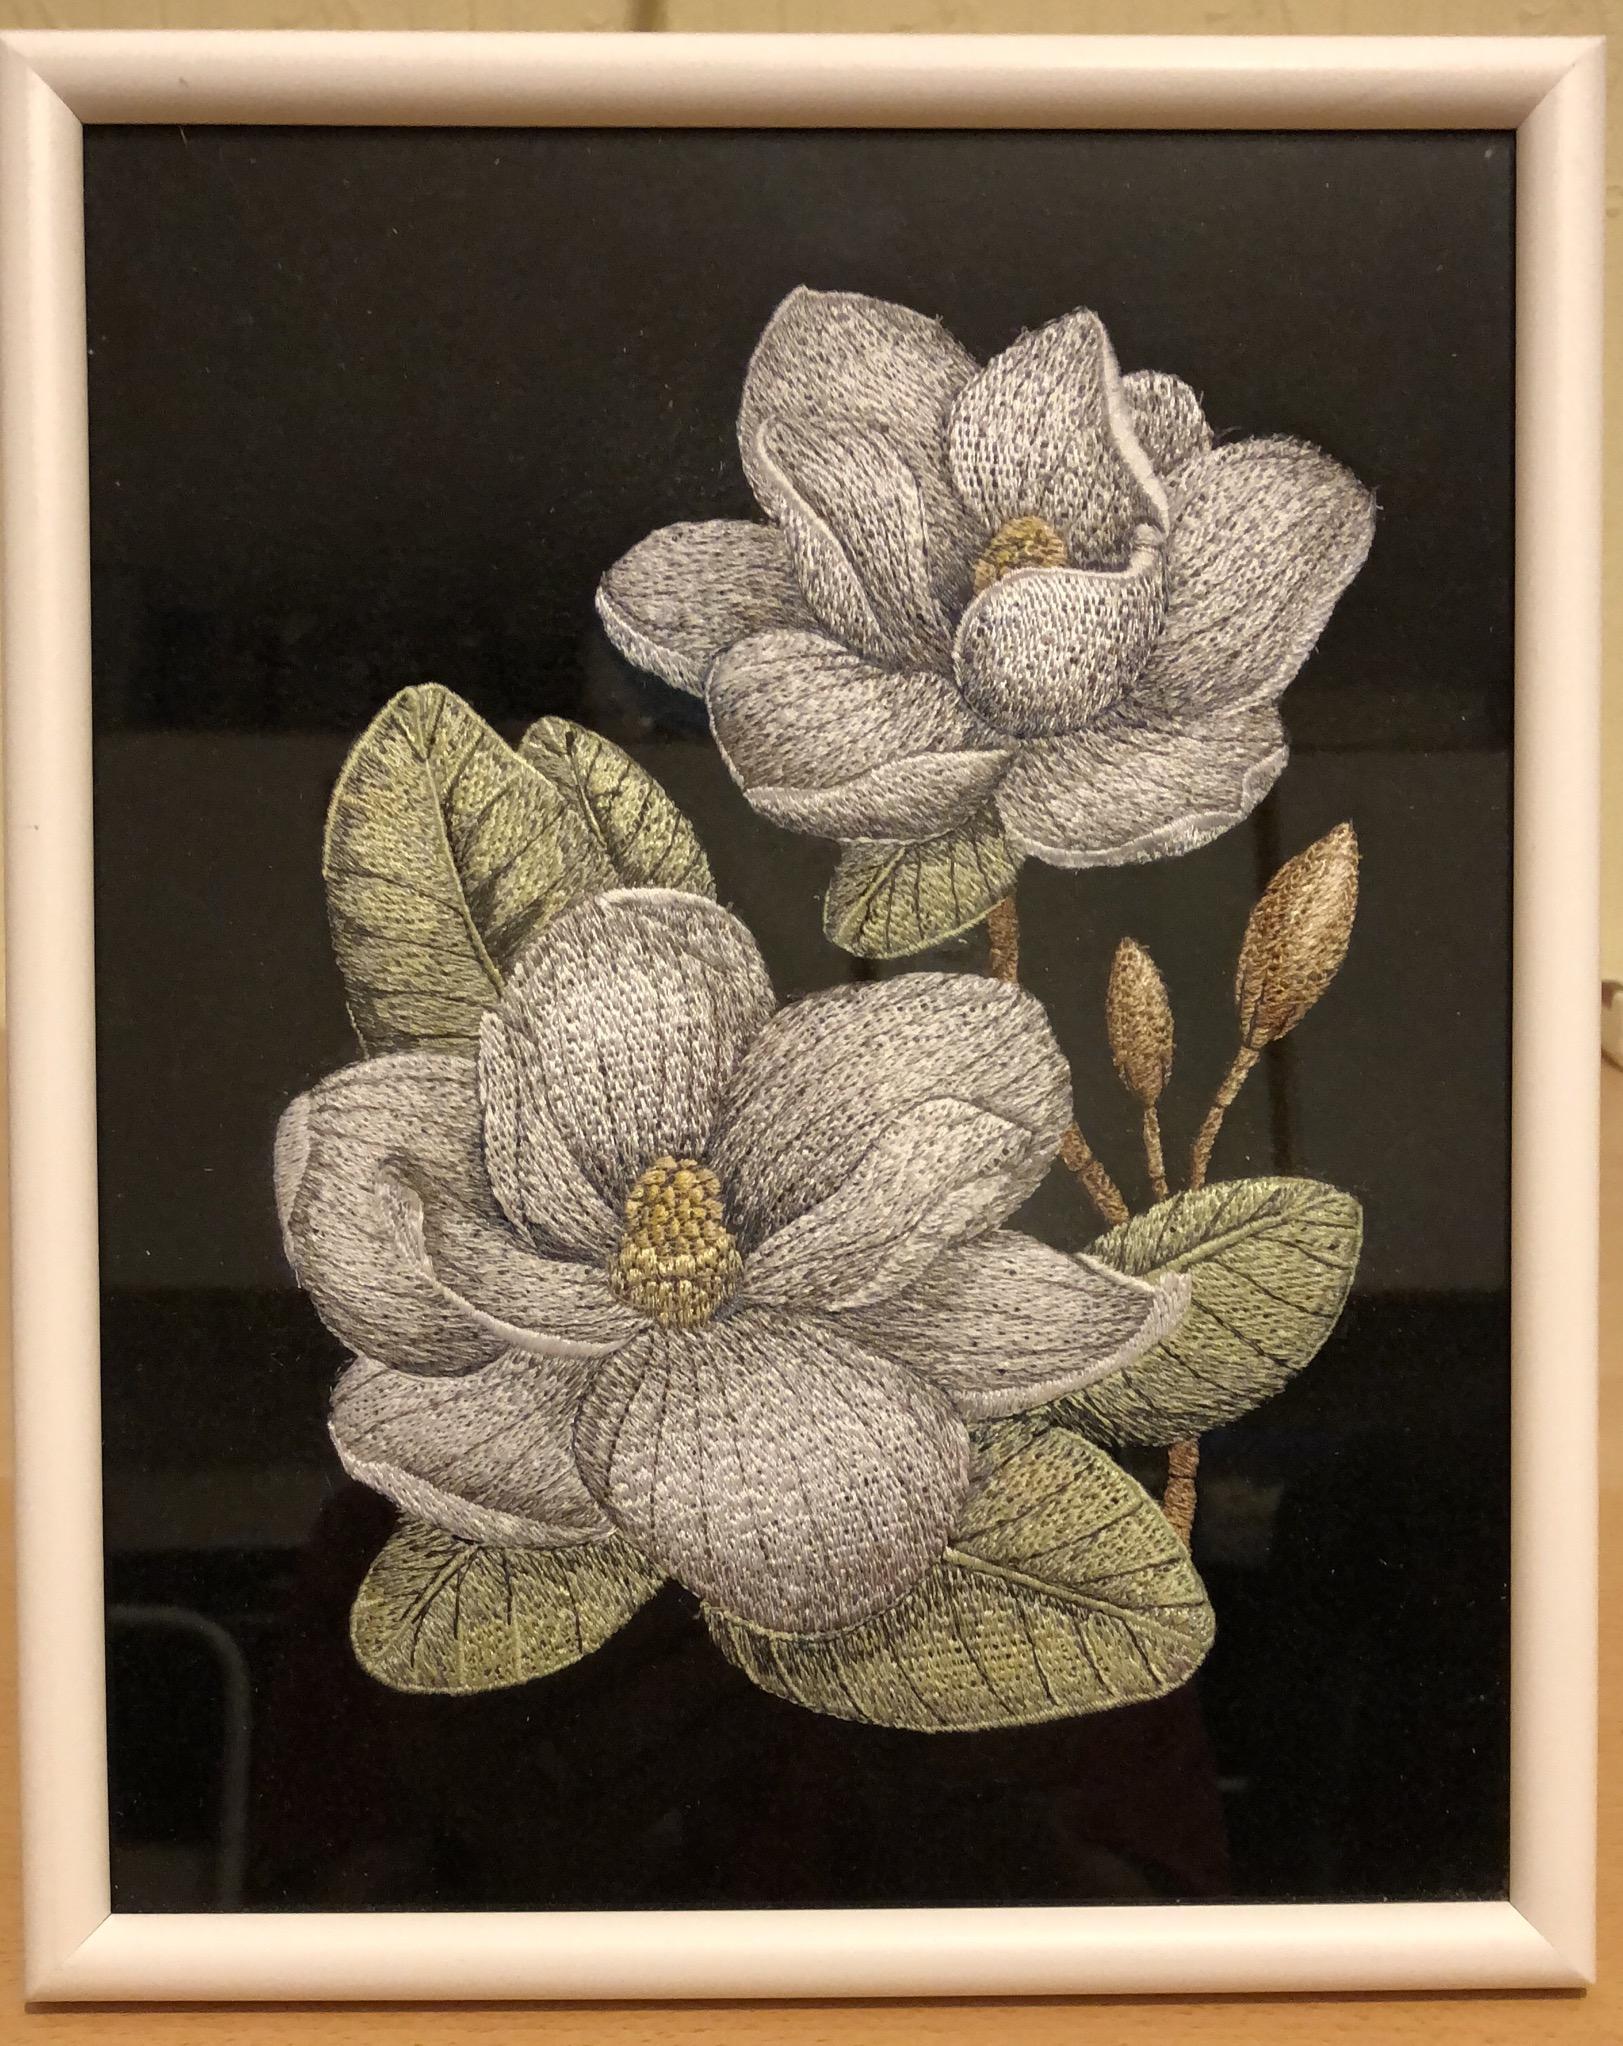 Embroidery/3BF351AB-C743-43C8-9168-4851E9077D78.jpeg